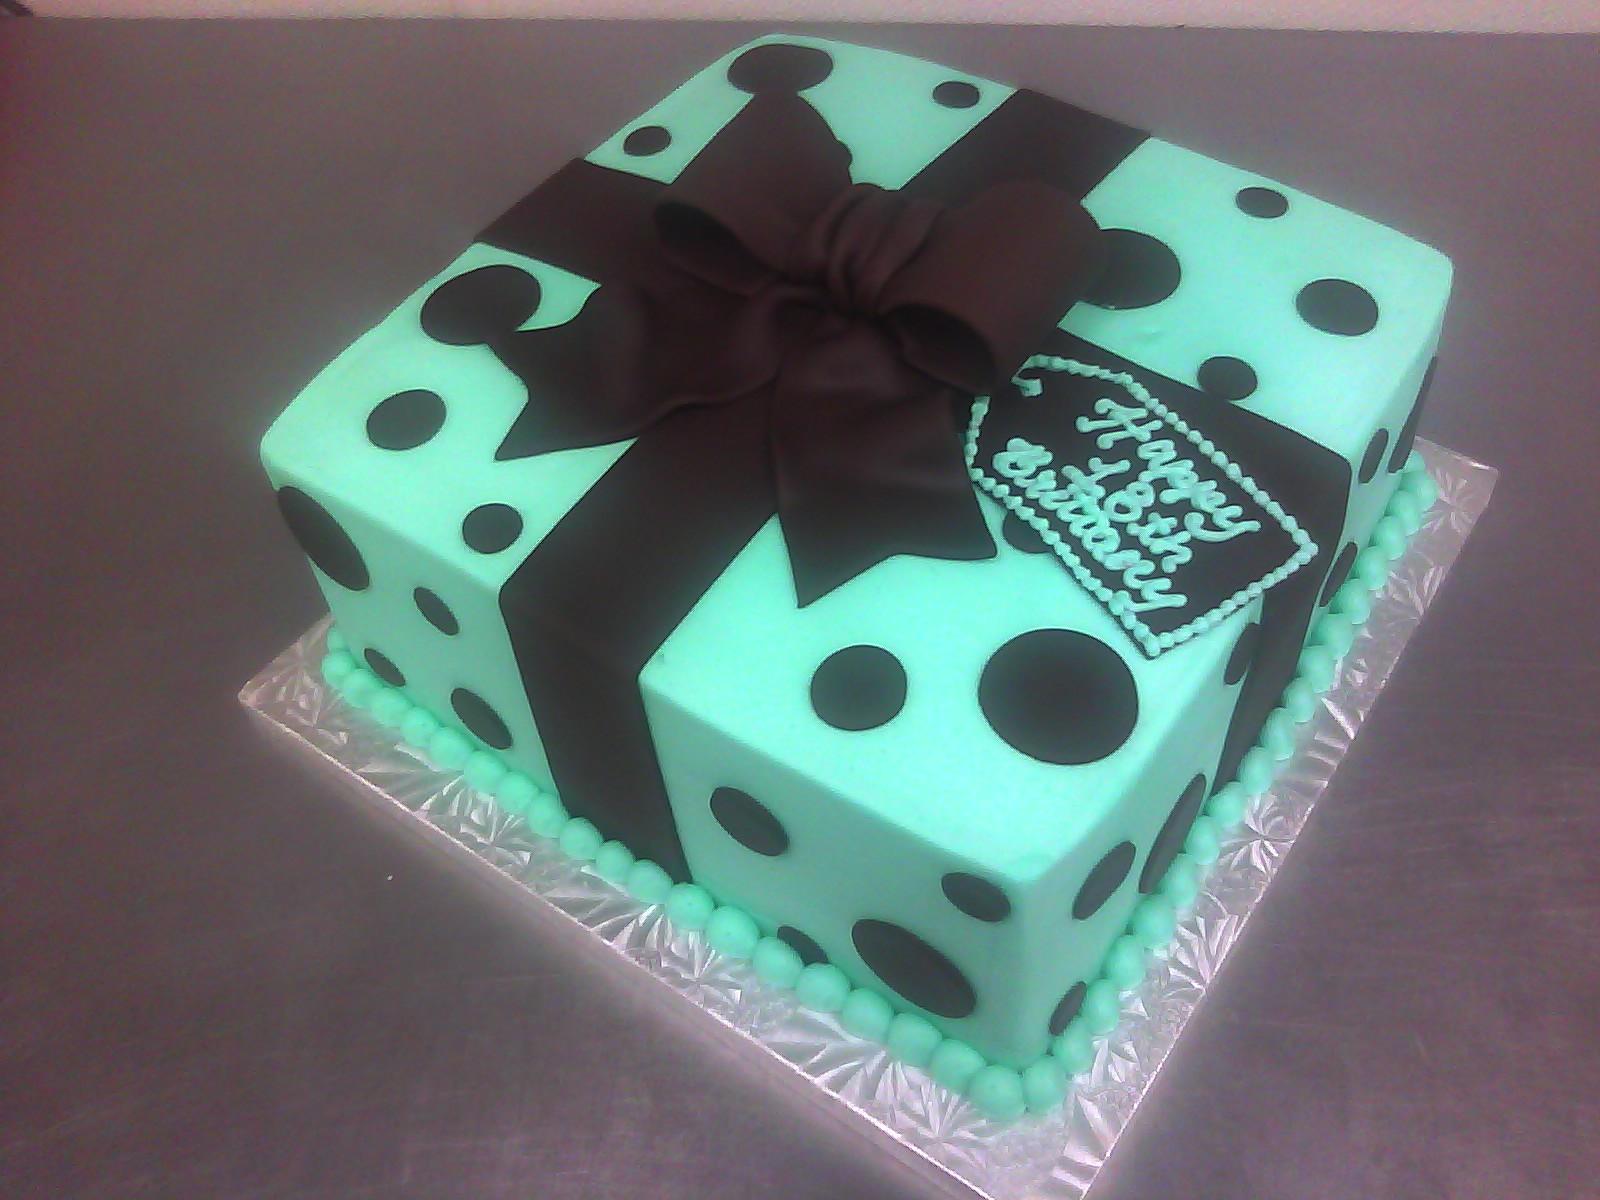 Birthday Present Teal Cake